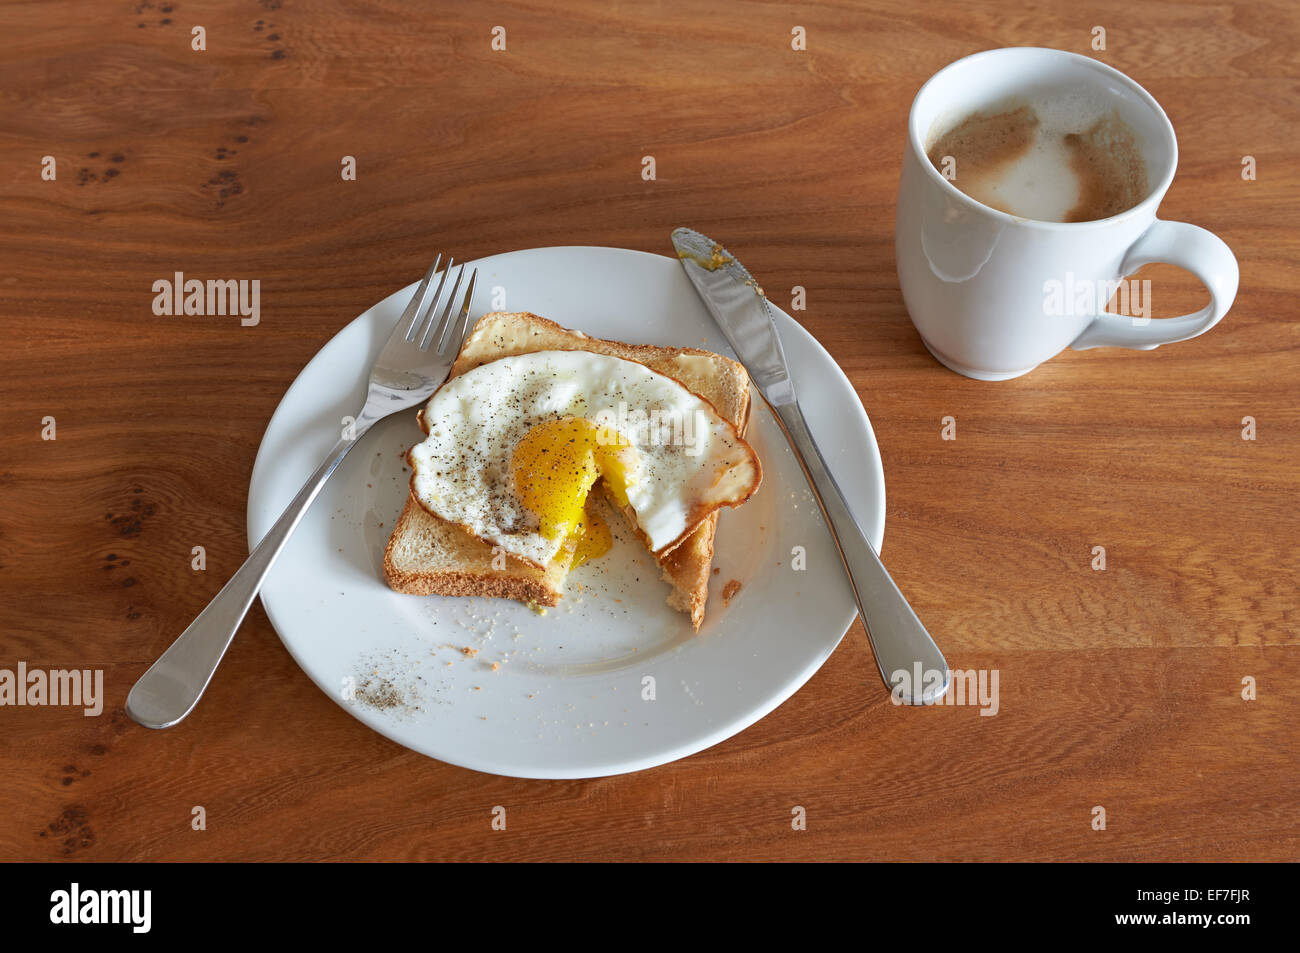 Huevo frito sobre una tostada con café Imagen De Stock